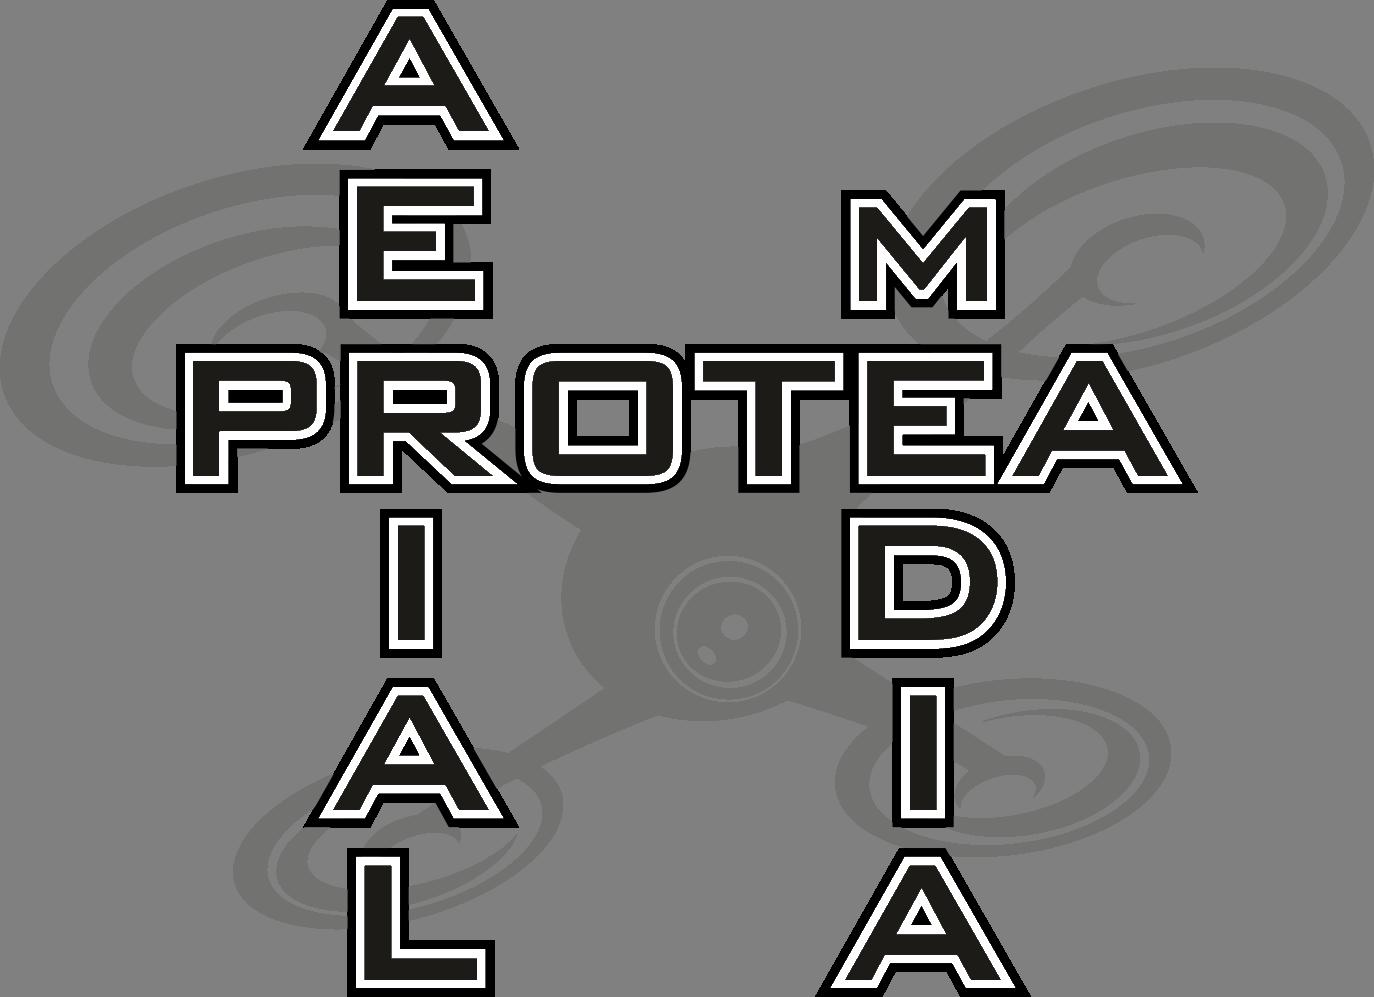 Protea Aerial Media